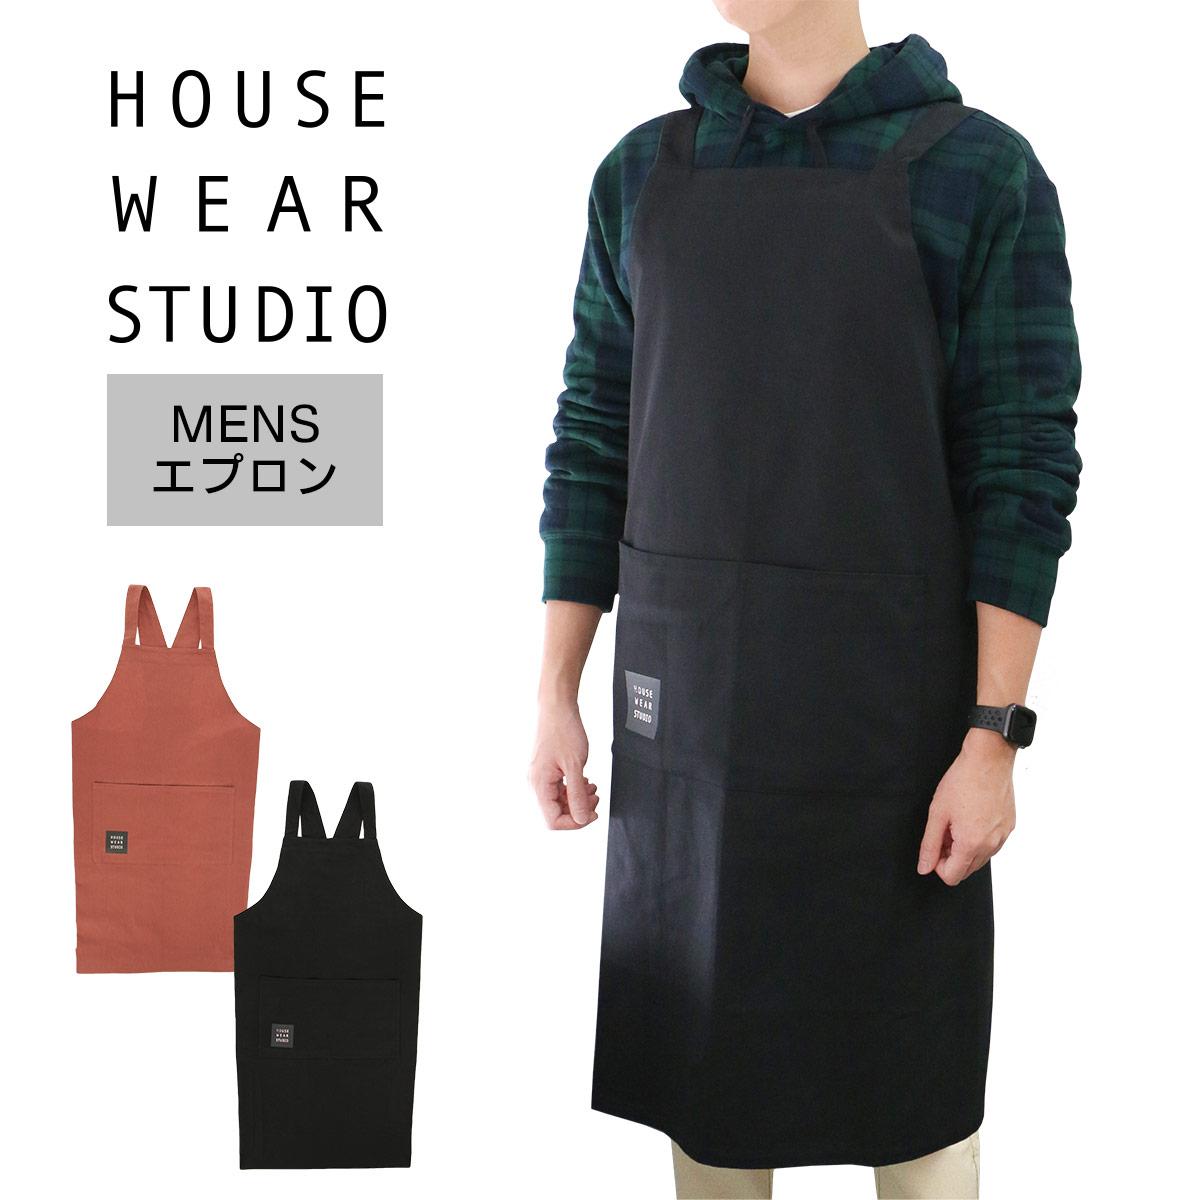 HOUSE WEAR STUDIO ハウスウェアスタジオ フリークロス 綿100% メンズ エプロン 70371871【ゆうパケットお取り扱い不可】